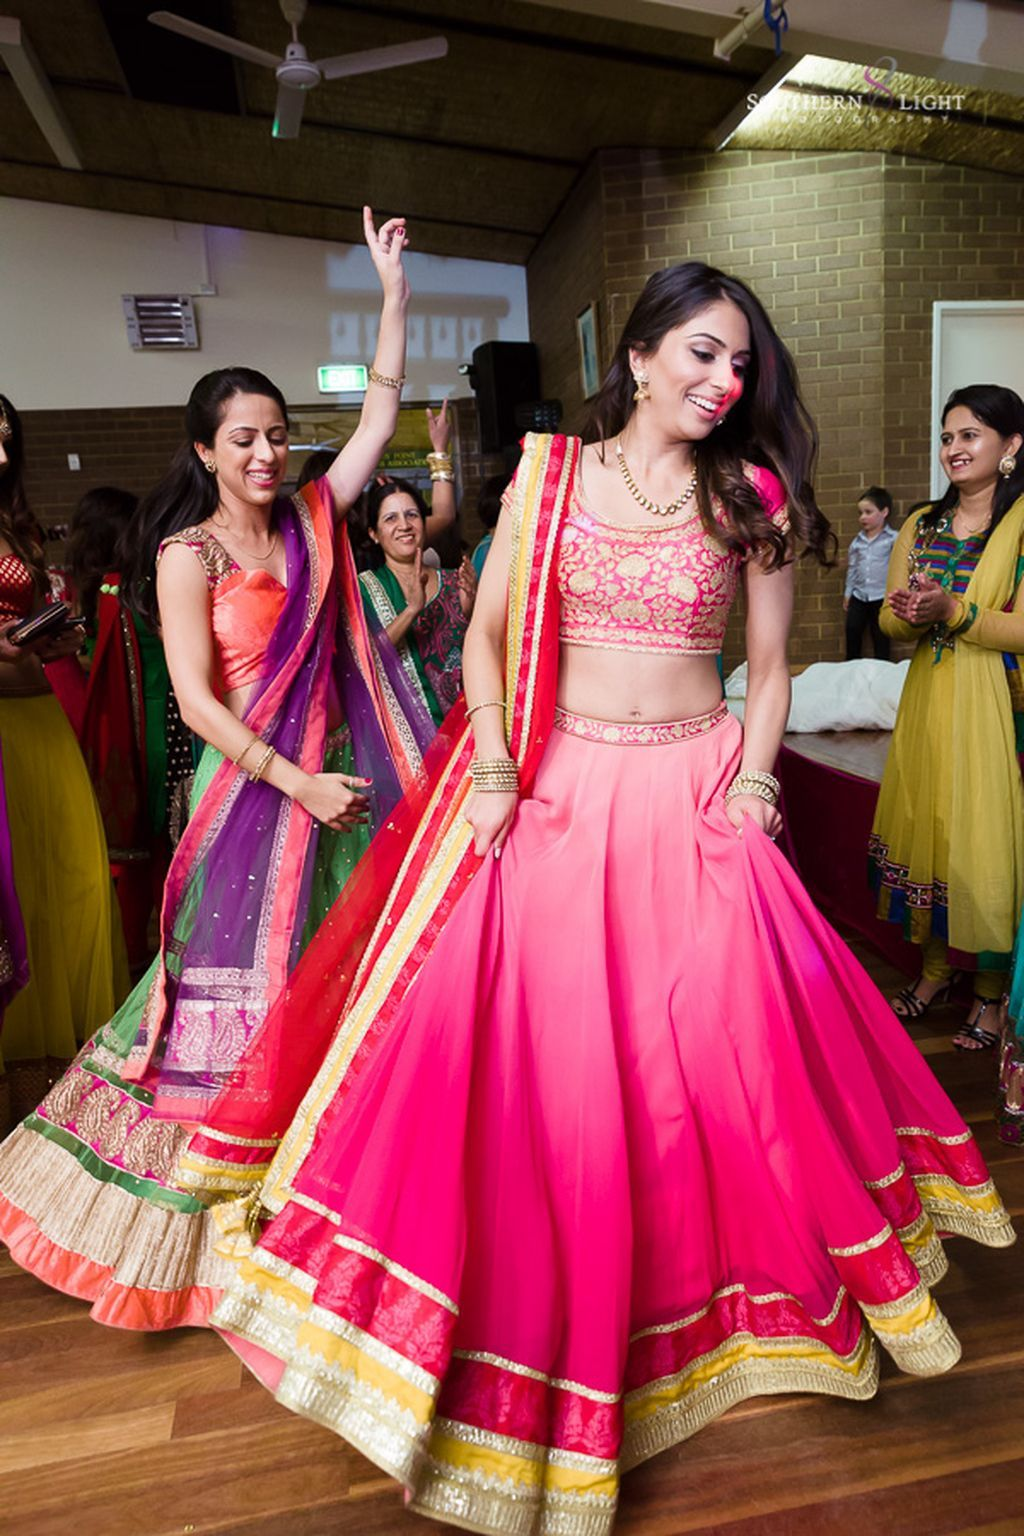 Mehndi Ceremony What To Wear : Event space religious punjabi glamorous romantic